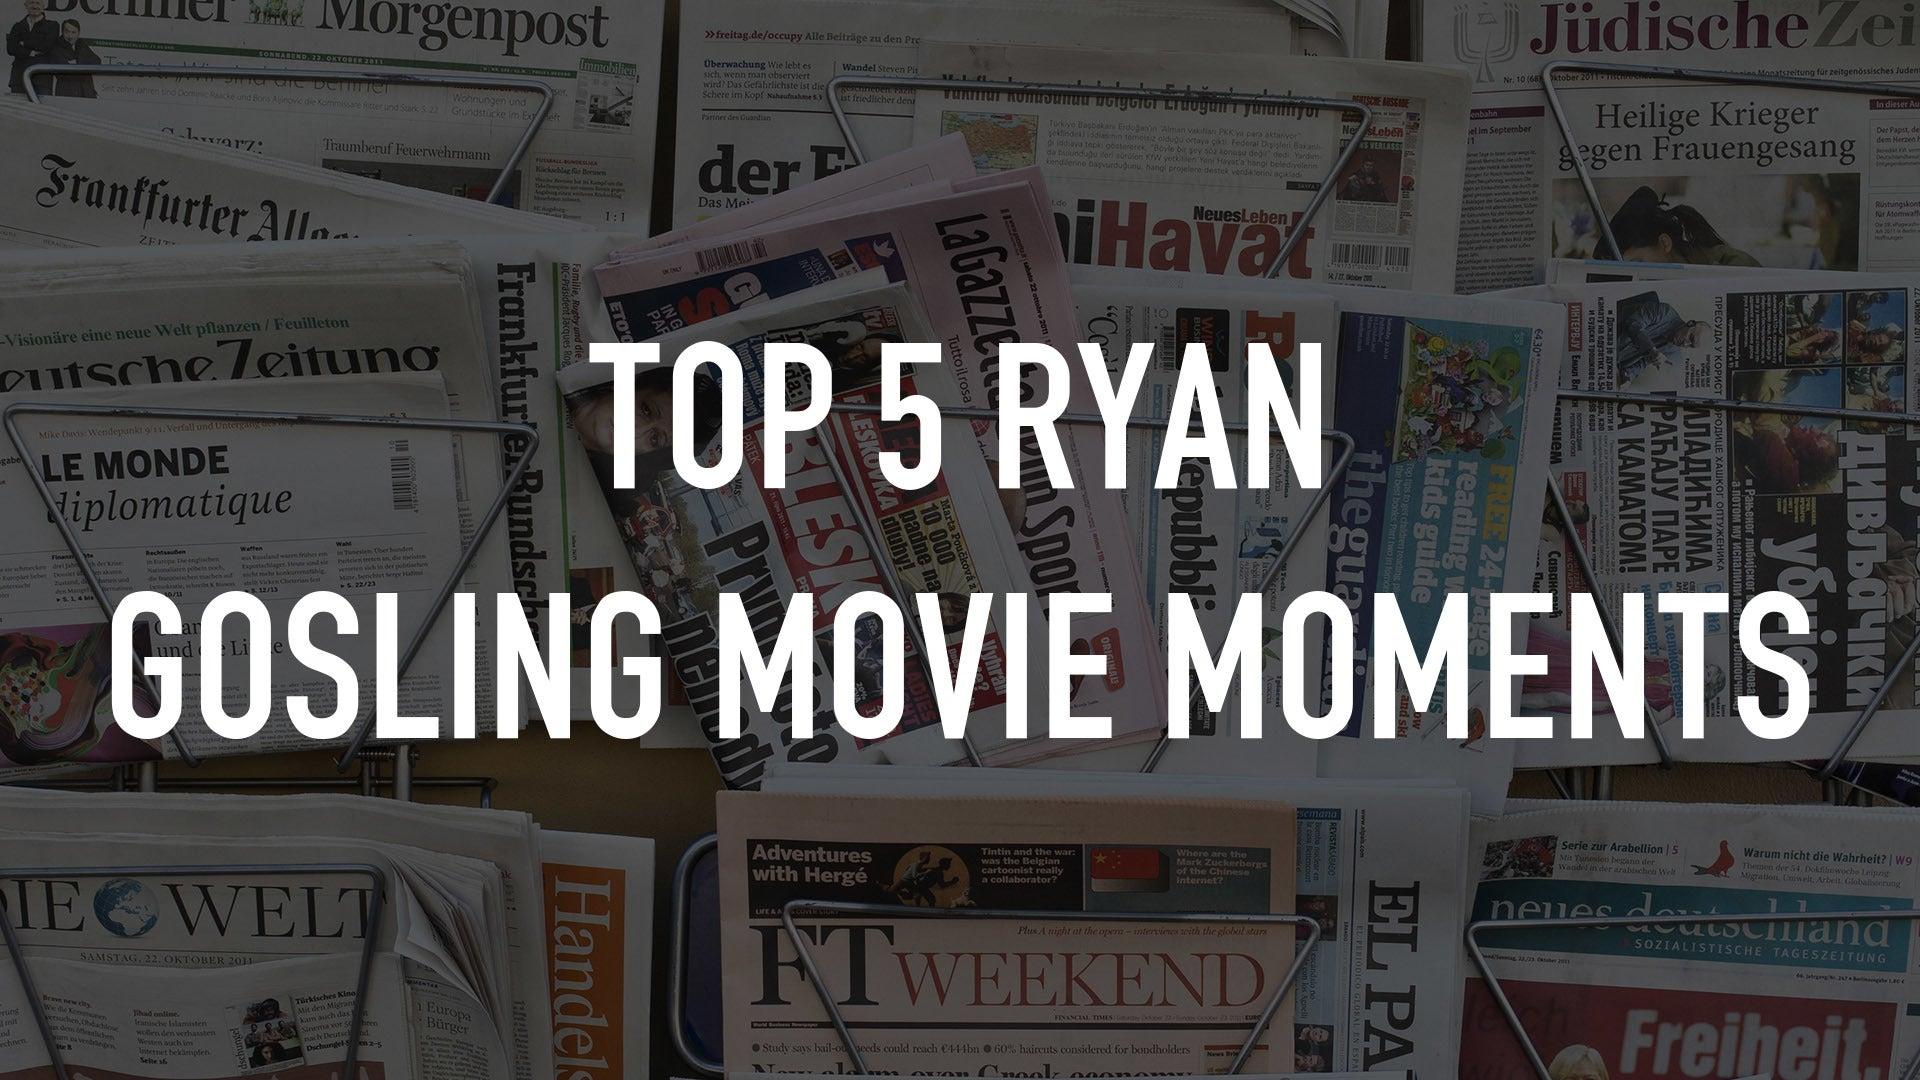 Top 5 Ryan Gosling Movie Moments